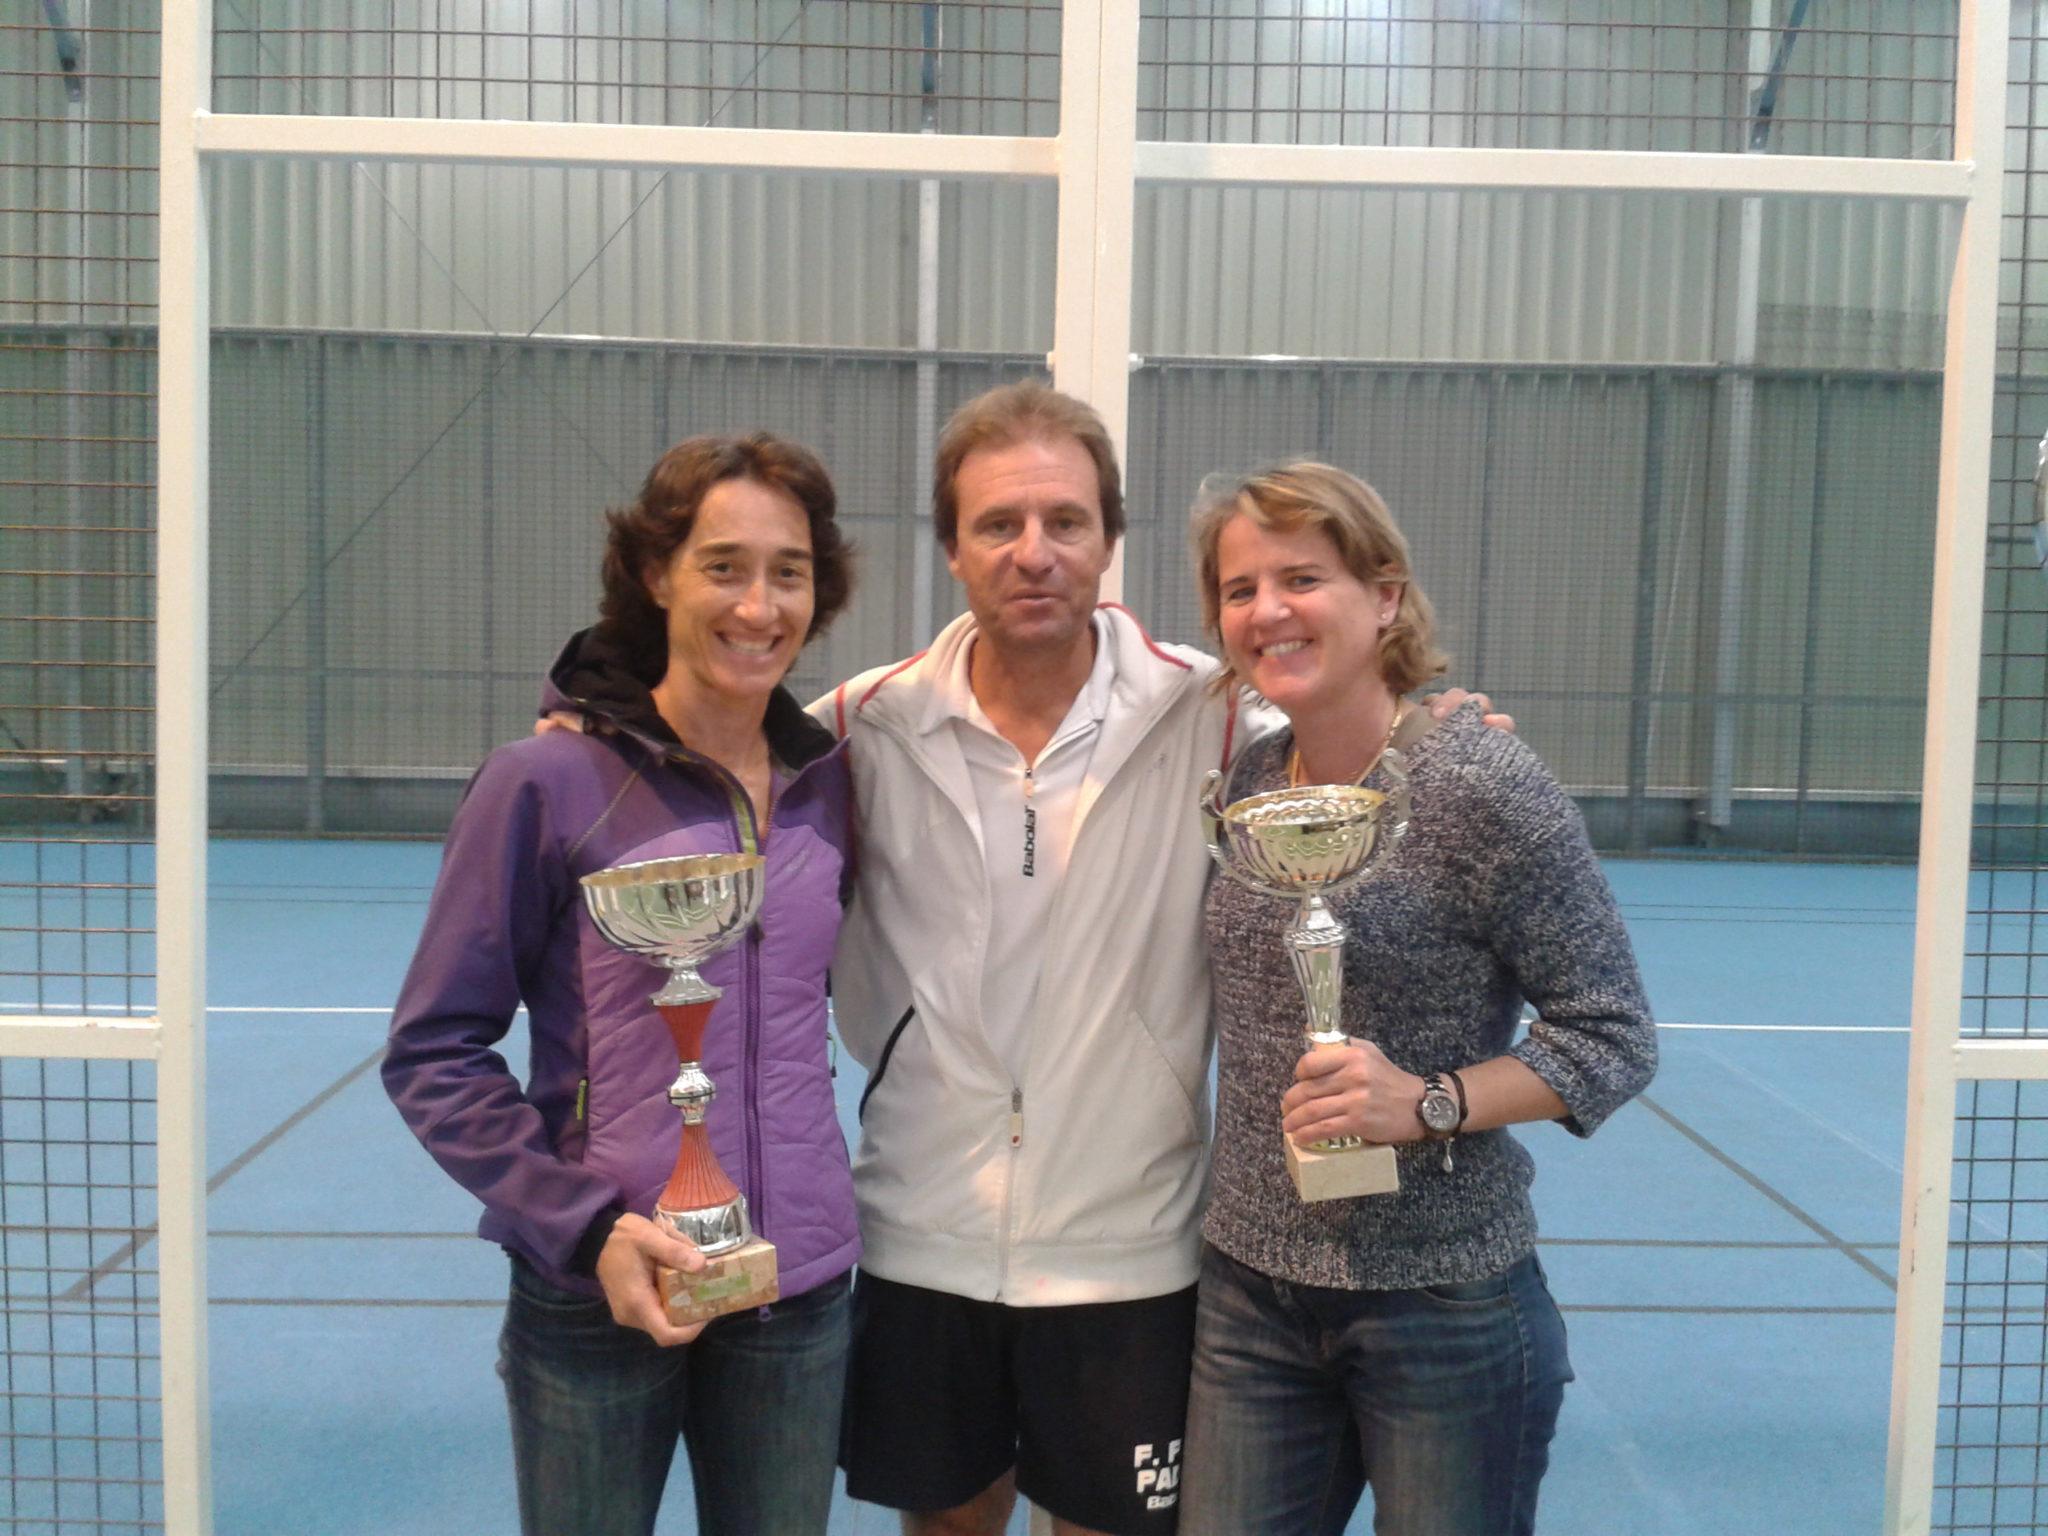 Les vainqueurs du master Féminin 2013